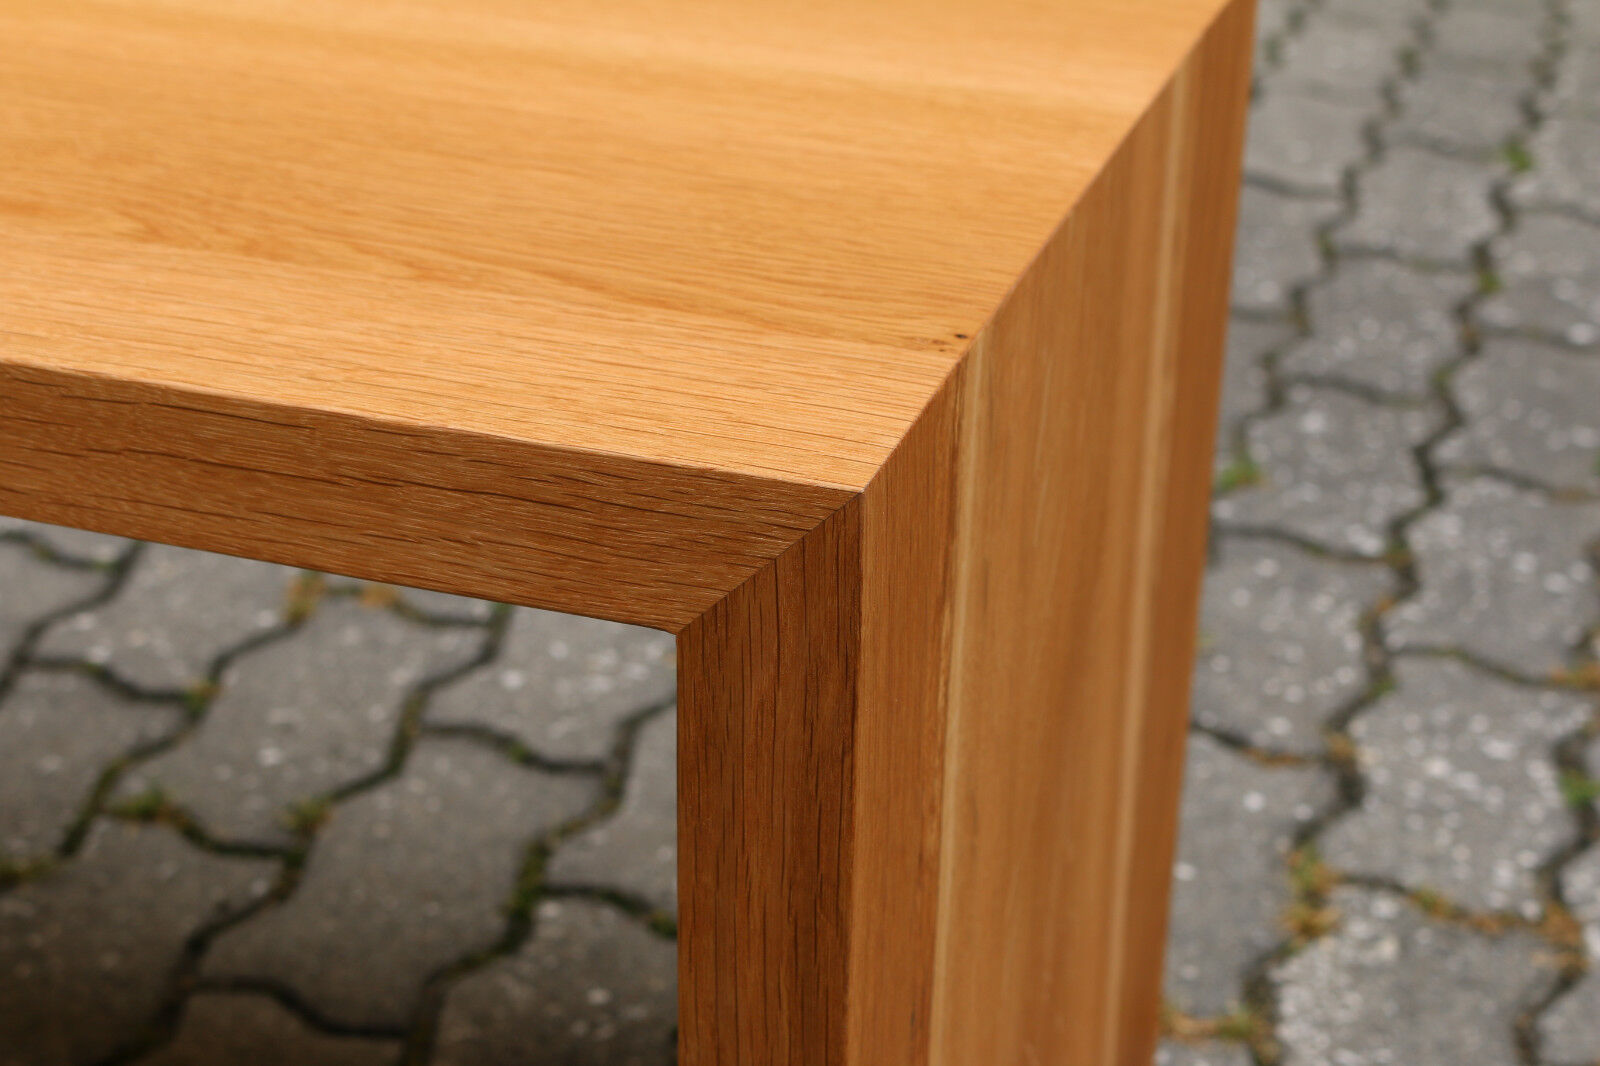 designer hocker aus eiche massiv holz sitzhocker neu stuhl sitzbank au auf ma chf. Black Bedroom Furniture Sets. Home Design Ideas